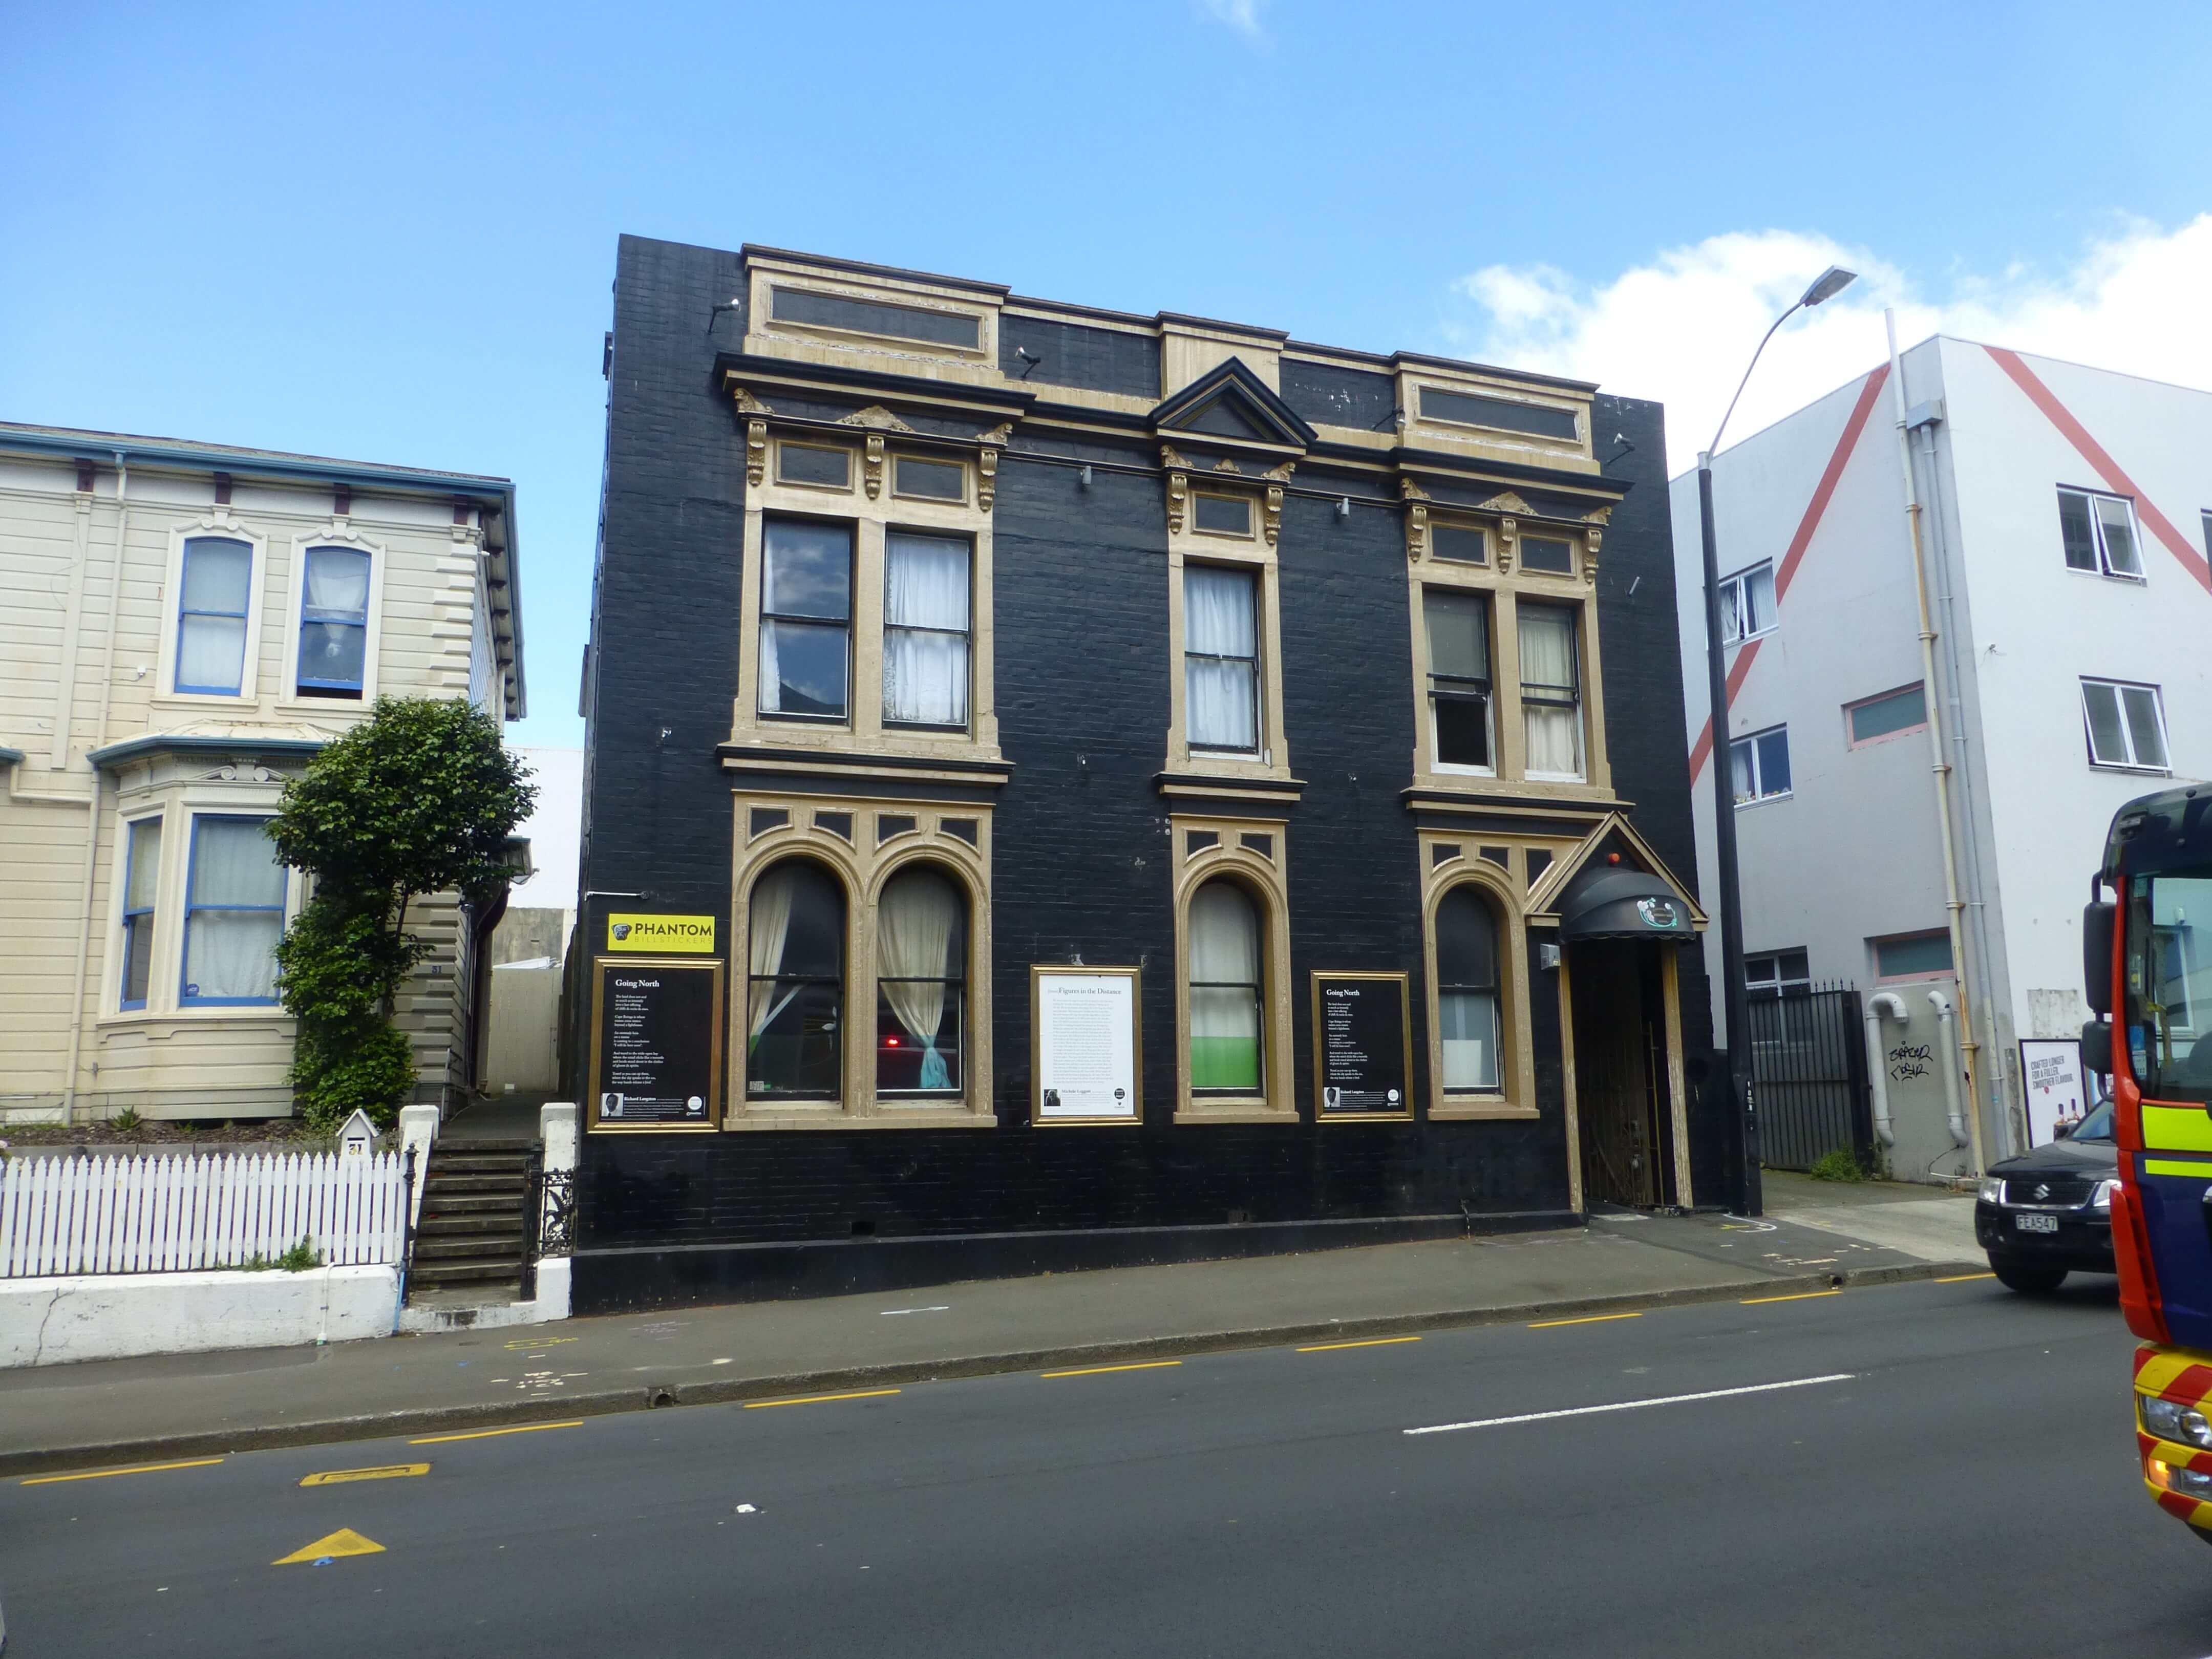 im Zentrum, Wellington, Neuseeland, Weit-weg.reisen 2